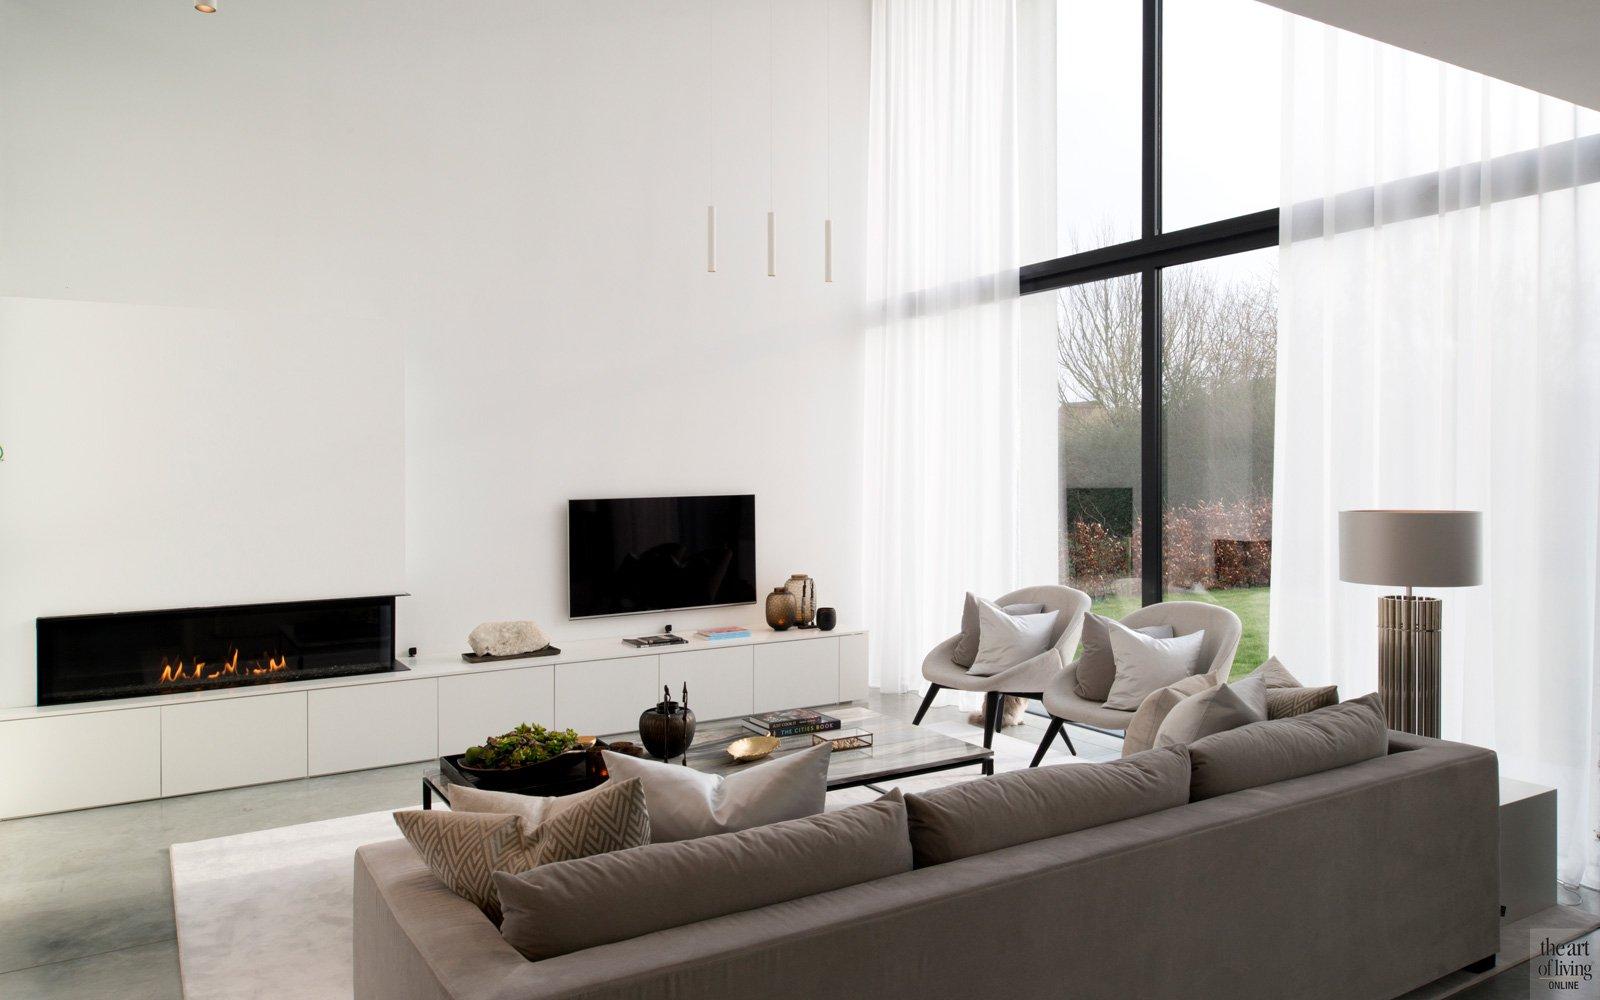 Woonkamer, living, hoge plafonds, hoge ramen, veel licht, vide, televisie, Kast-ID, tv-meubel, hedendaagse villa, Leers & partners